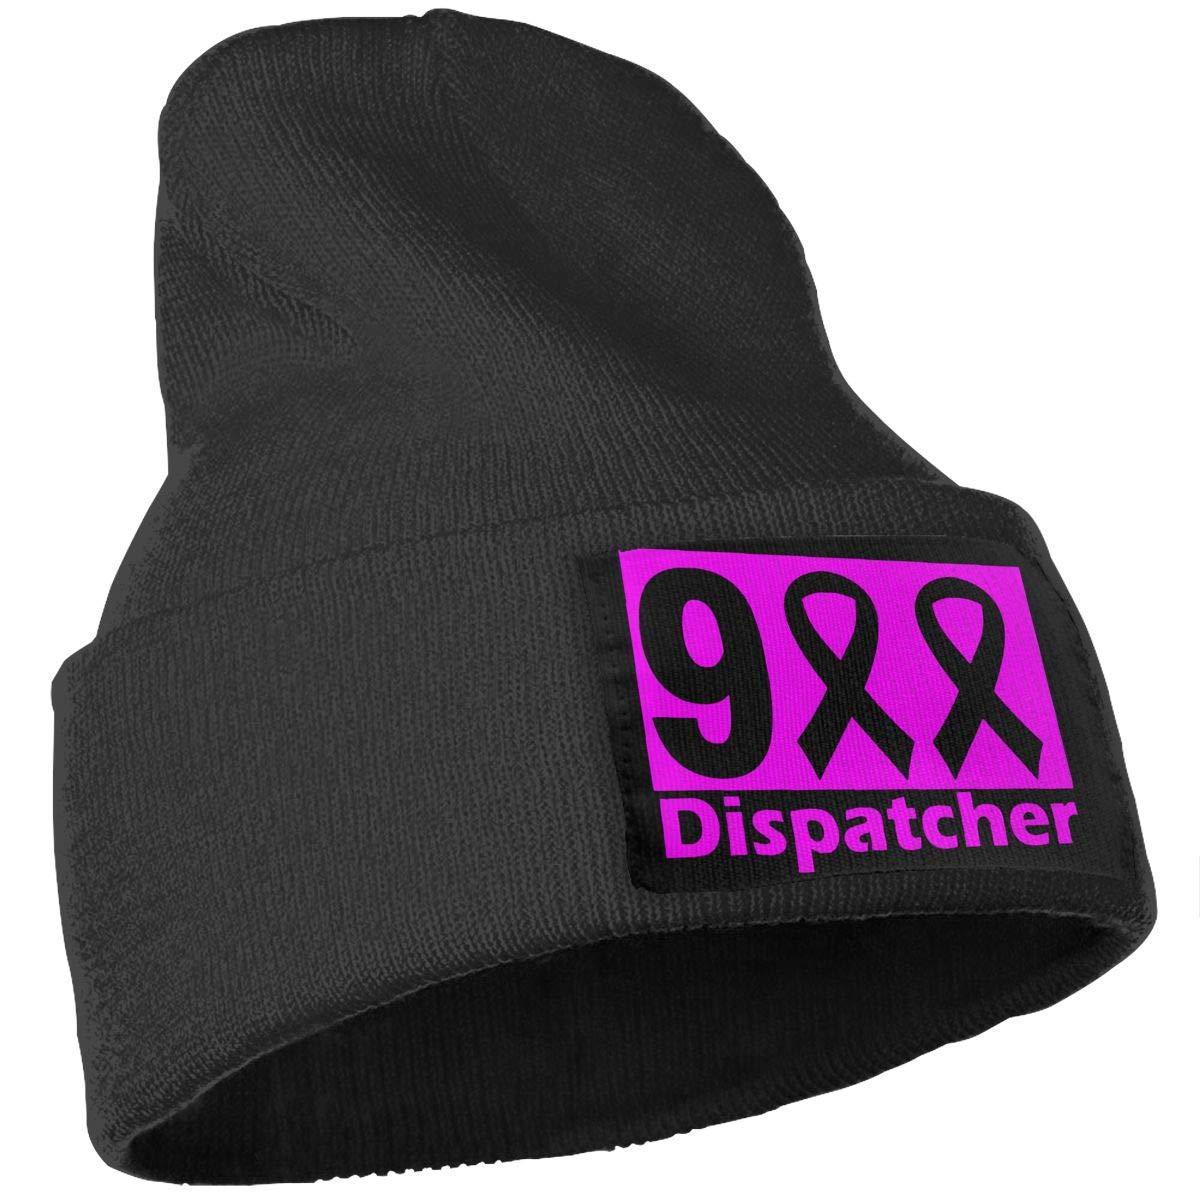 COLLJL-8 Men//Women 911 Dispatcher Outdoor Stretch Knit Beanies Hat Soft Winter Skull Caps